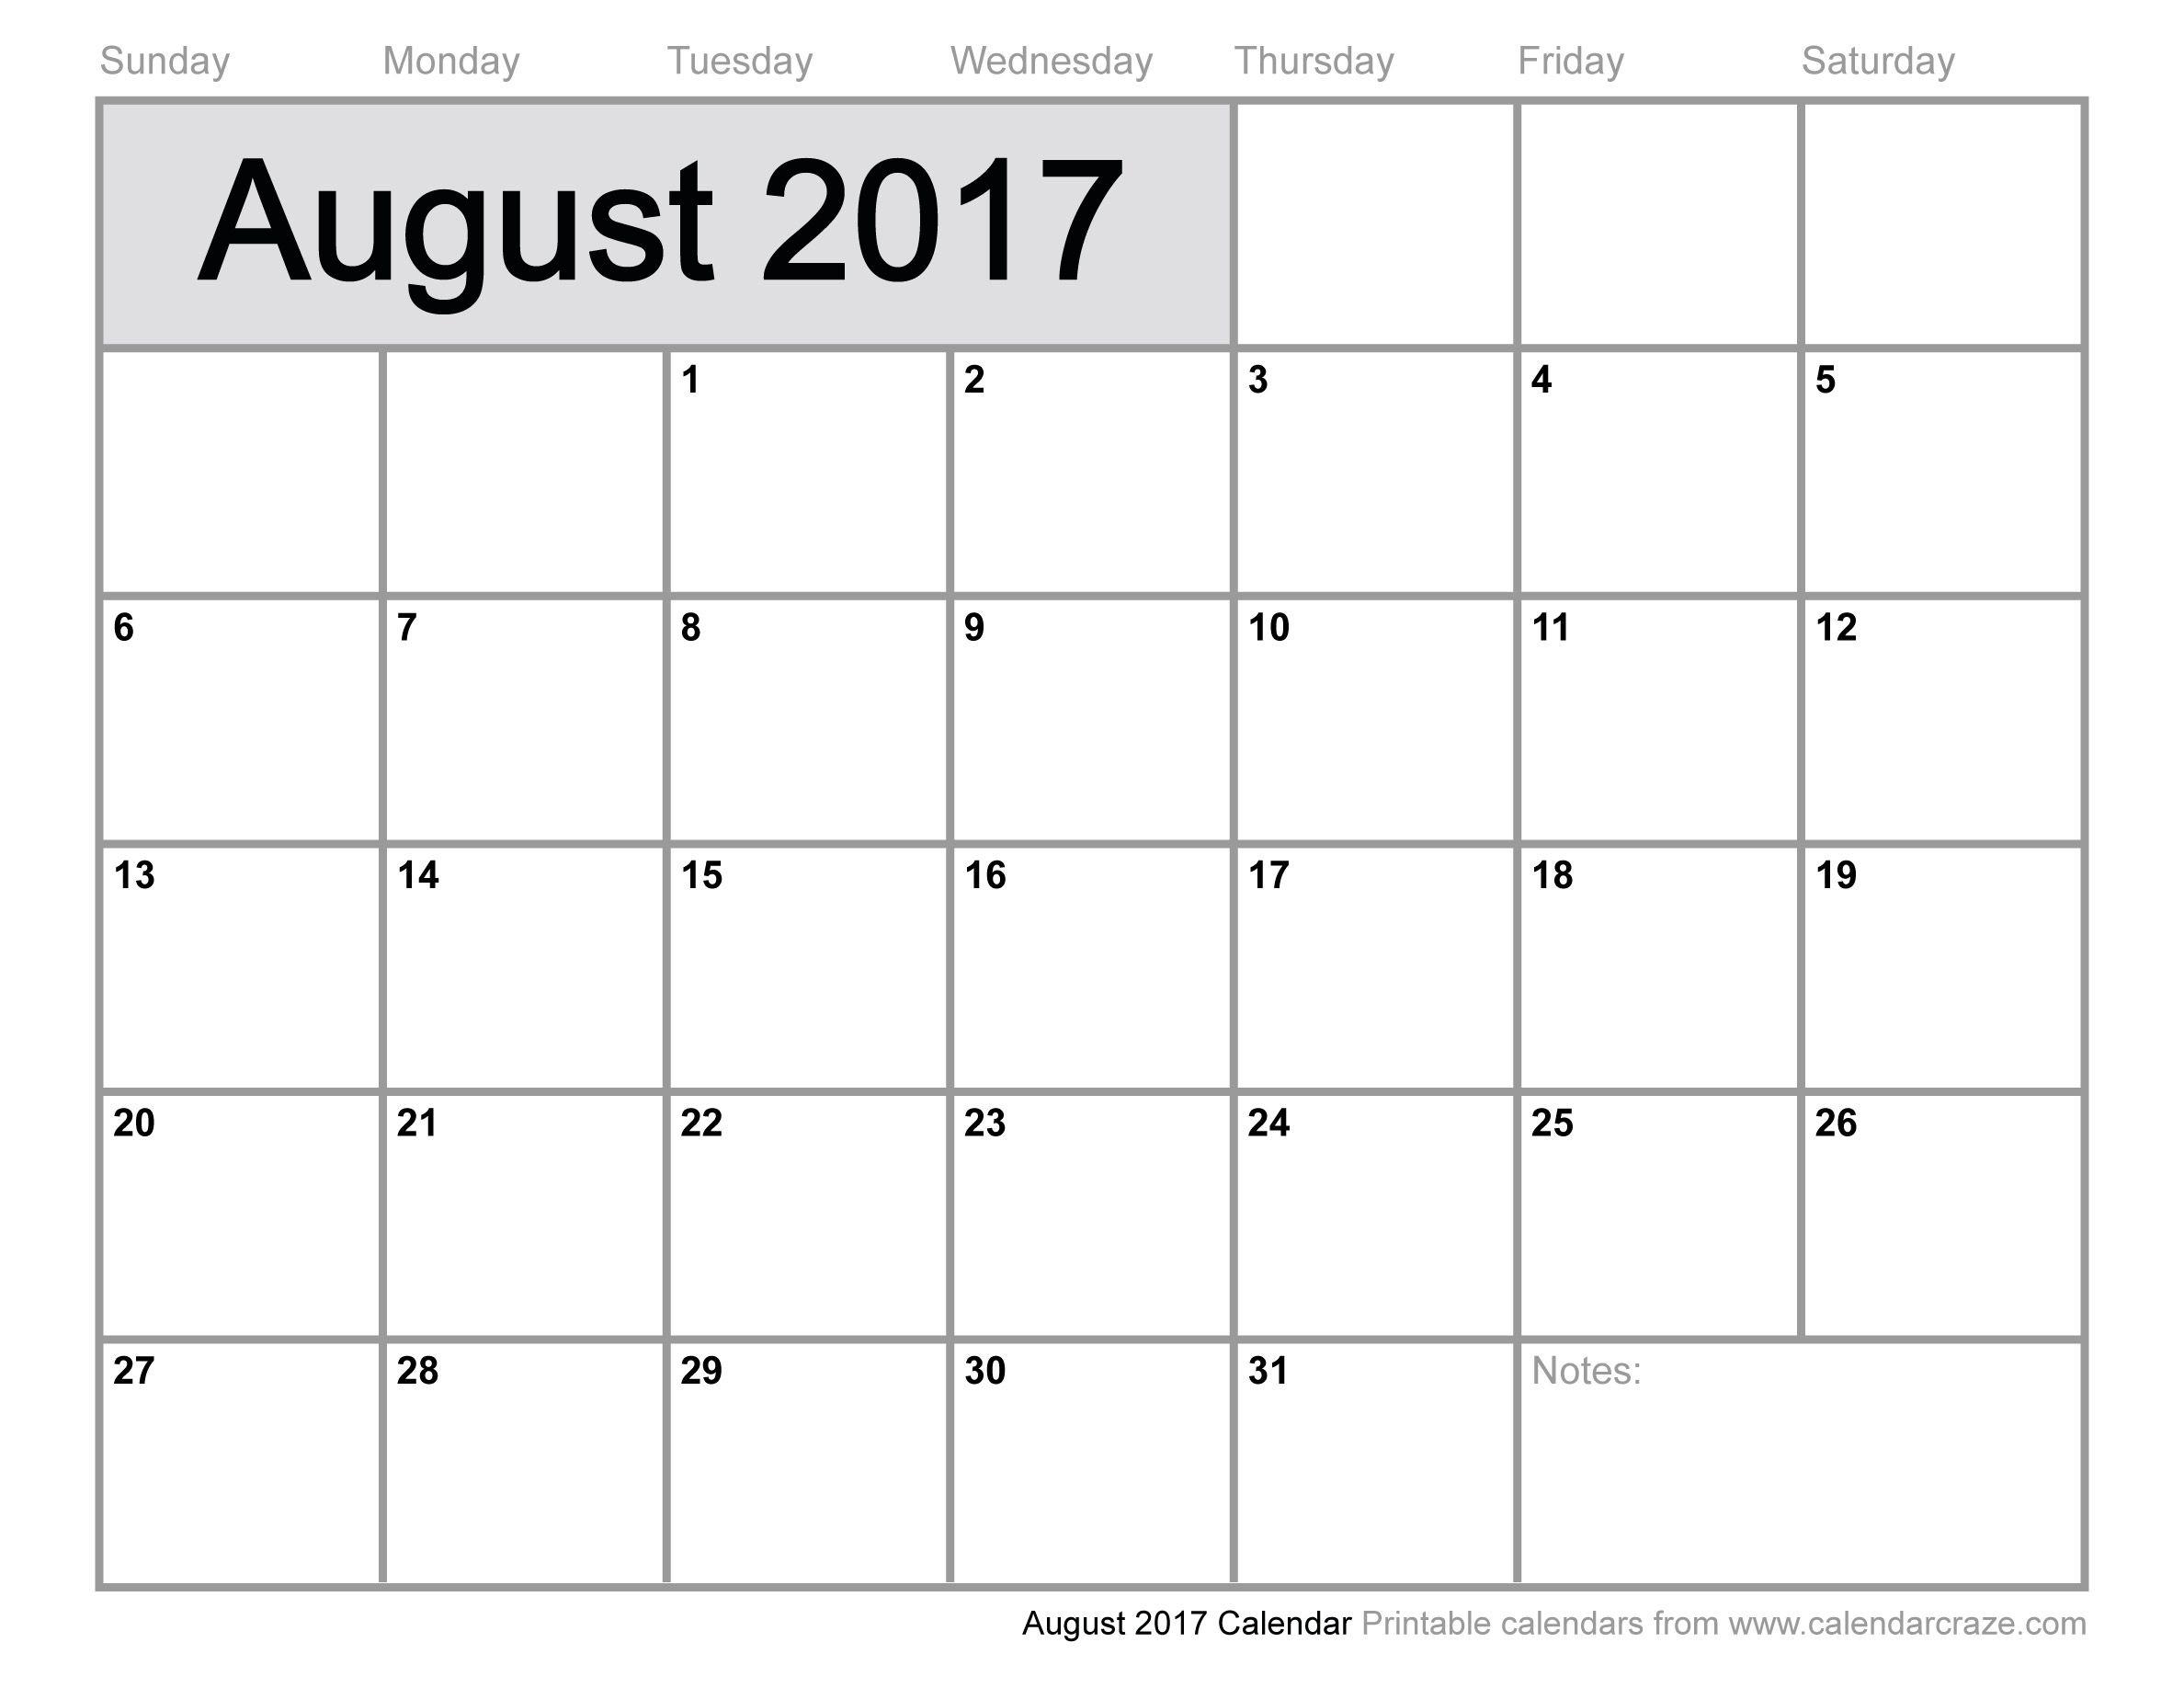 August 2017 Calendar Uk, August 2017 Uk Calendar, August Calendar Uk - Free Printable August 2017